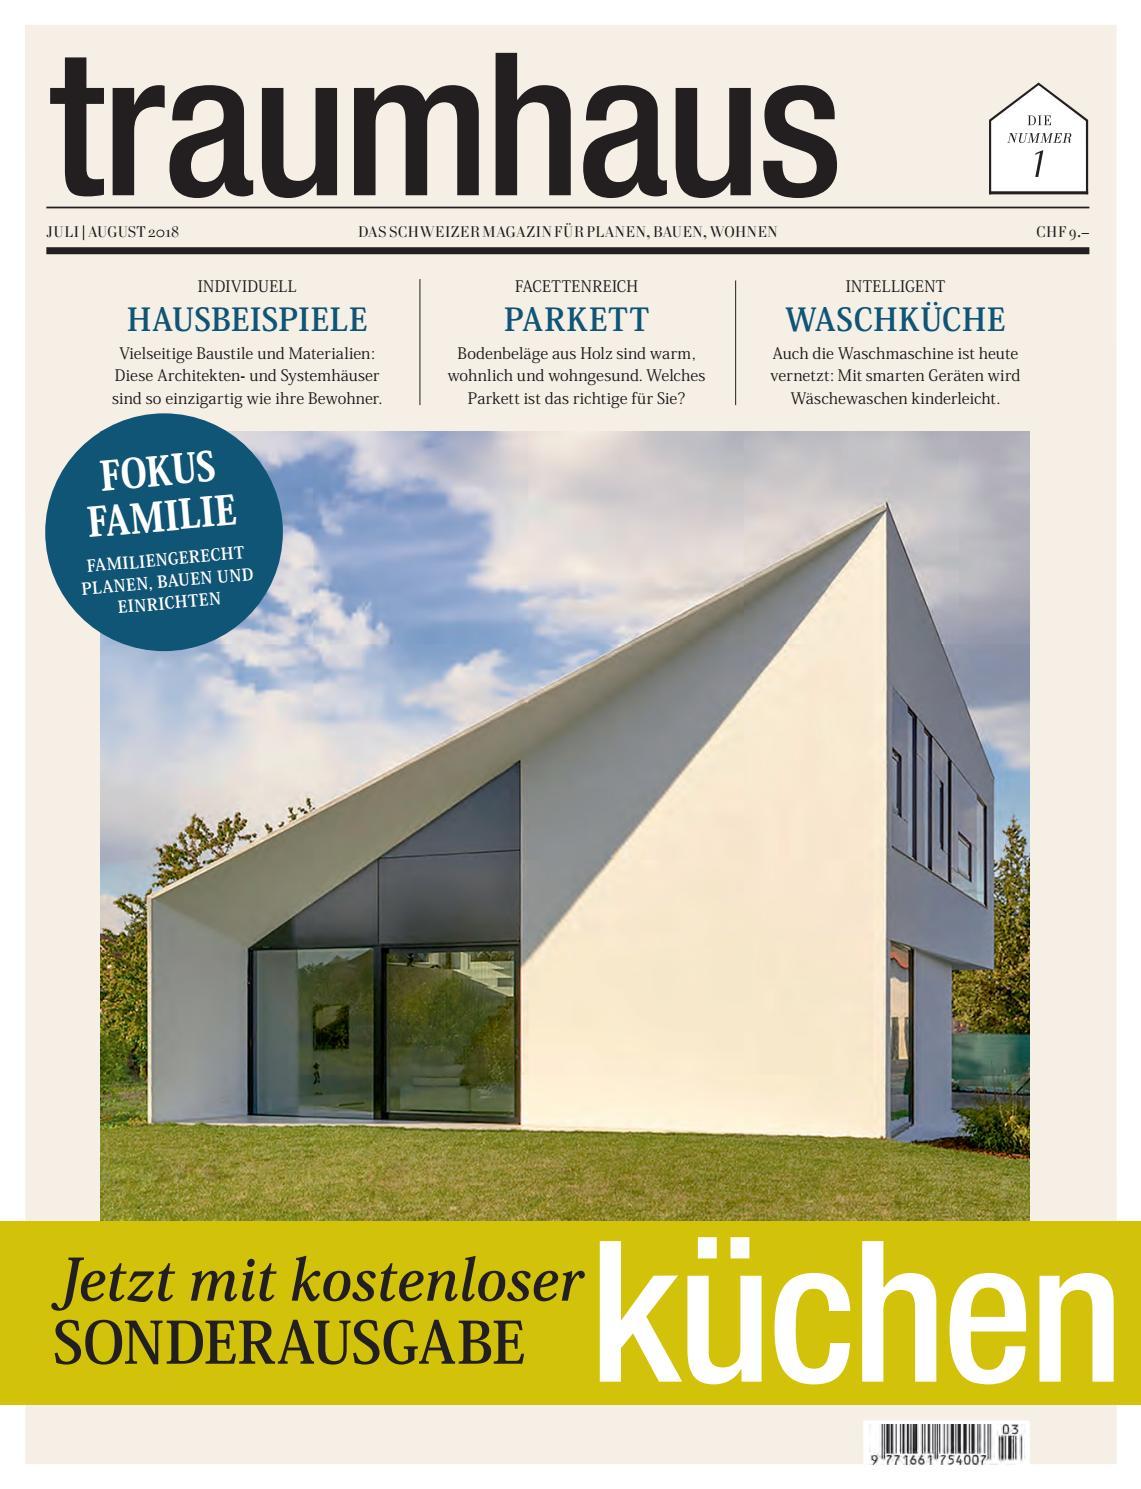 traumhaus 03 2018 by BL Verlag AG - issuu